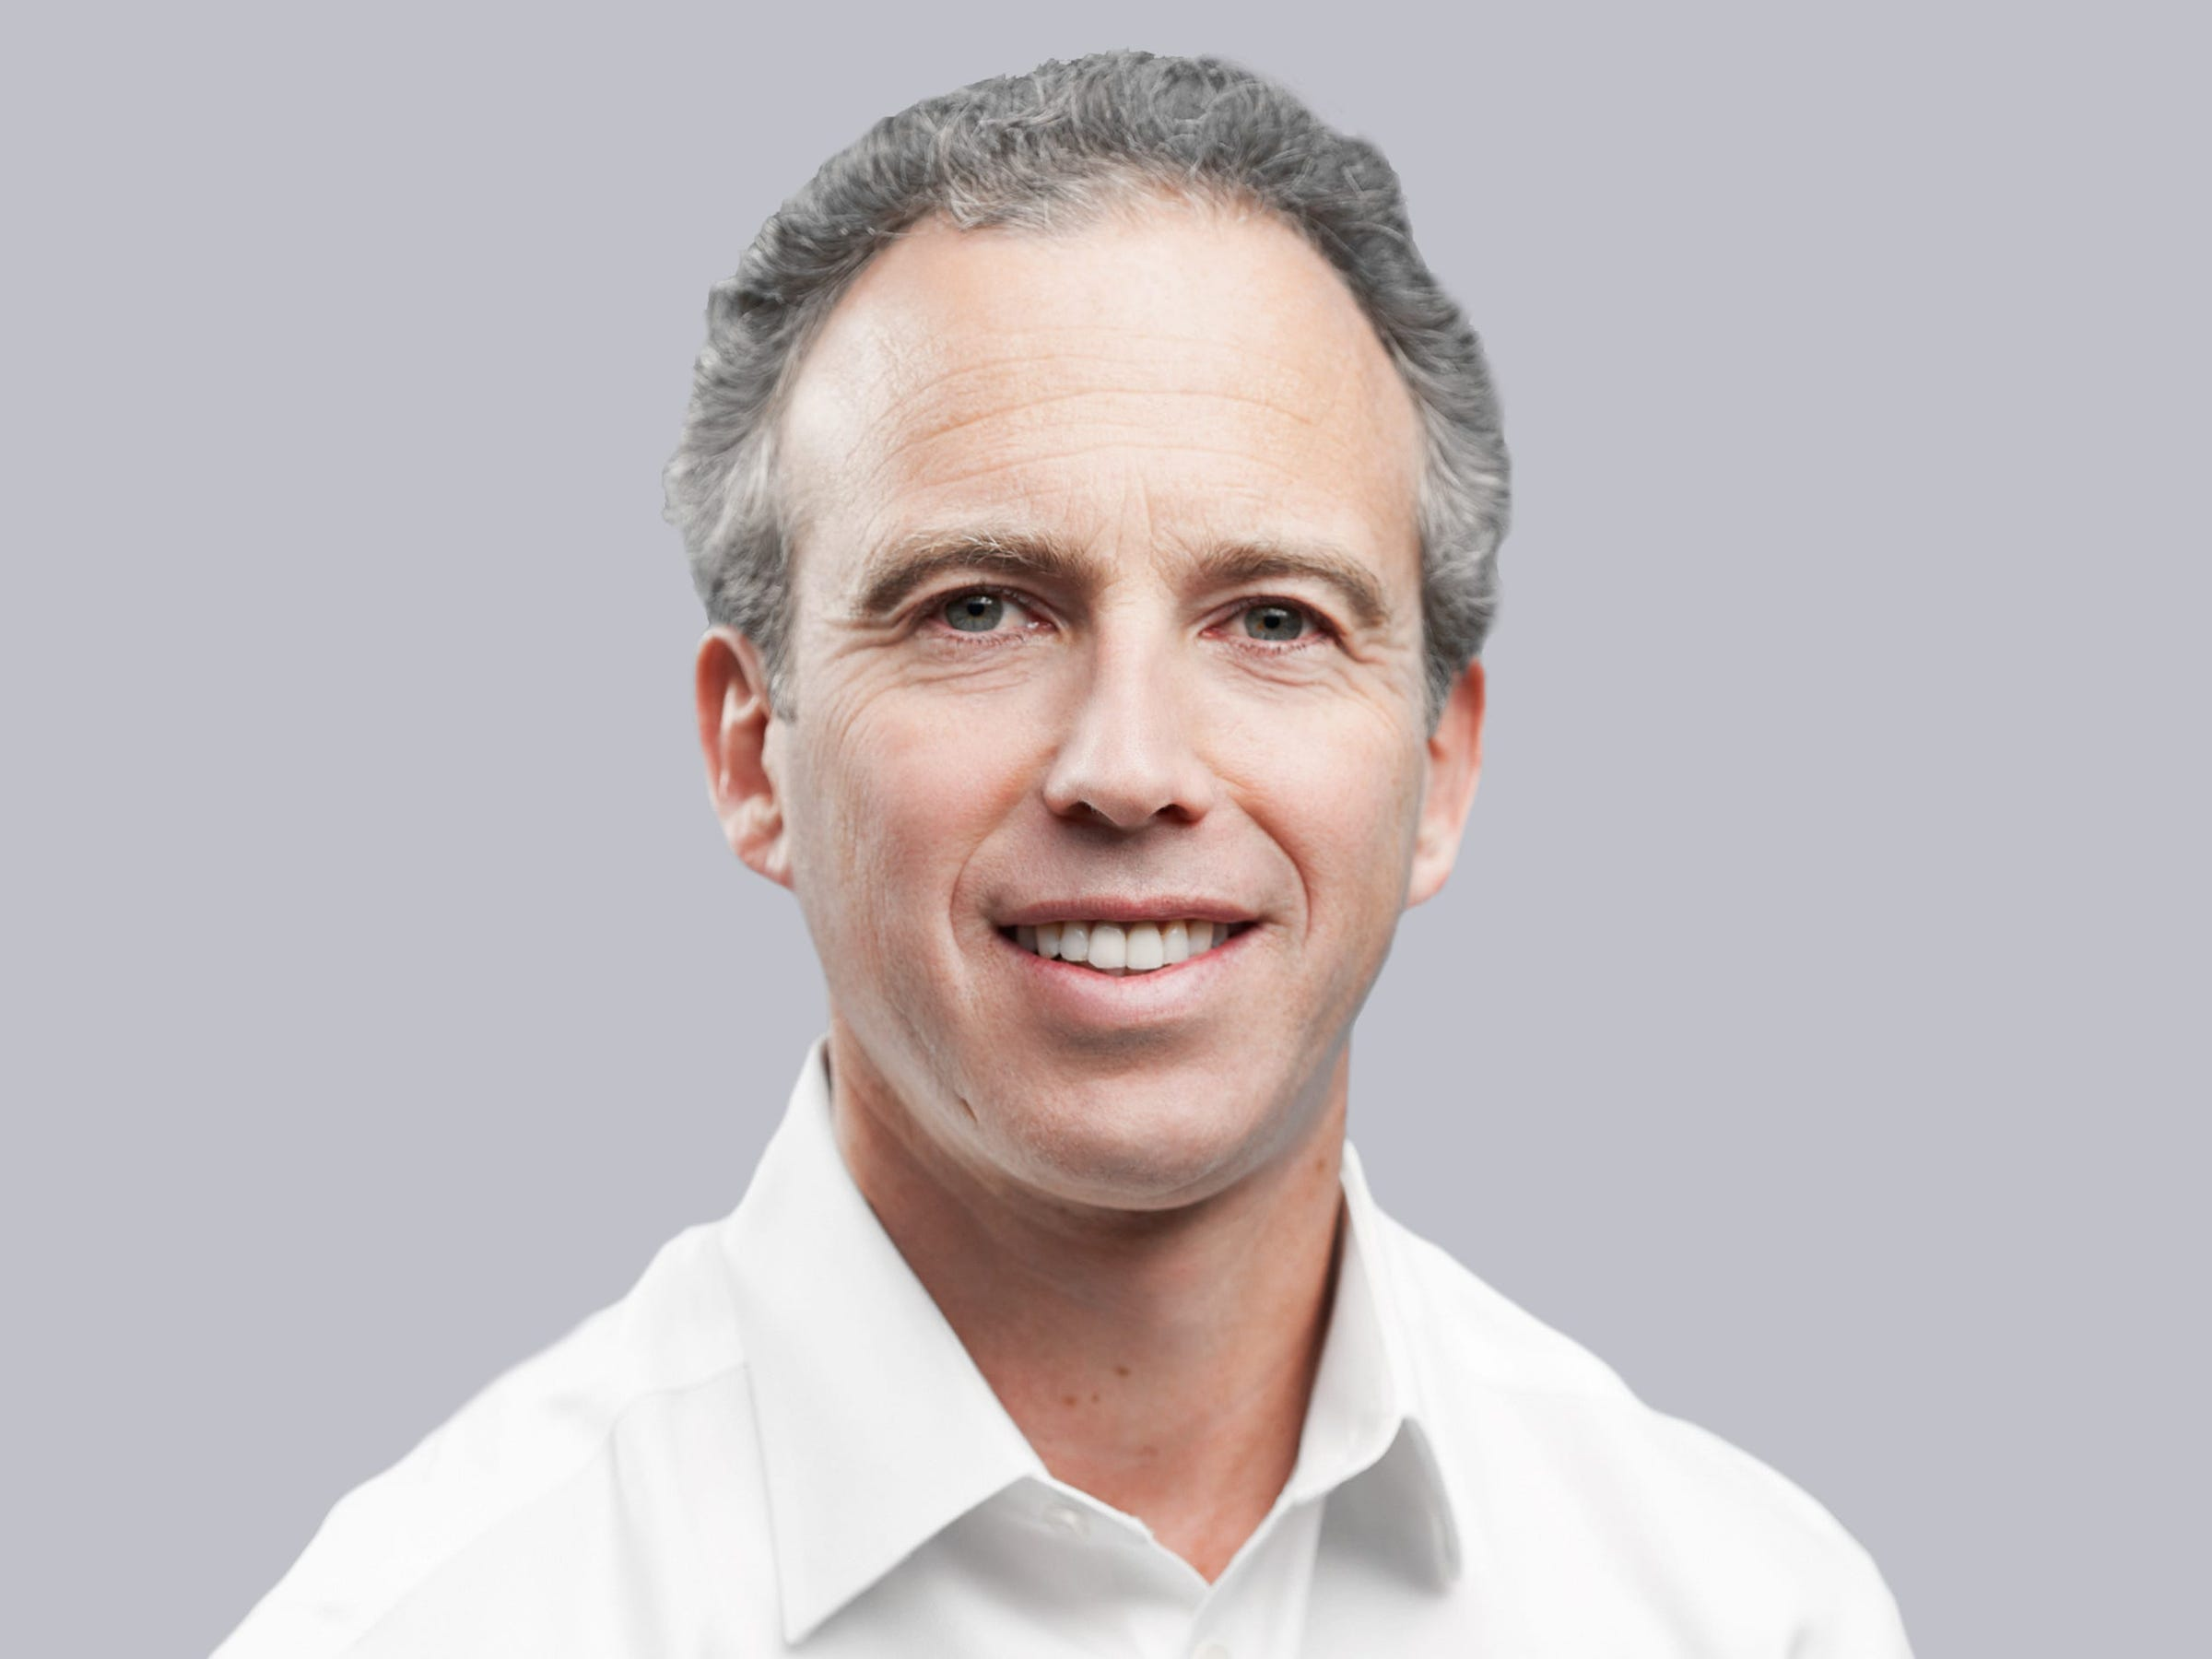 Frederic Kerrest Official Headshot